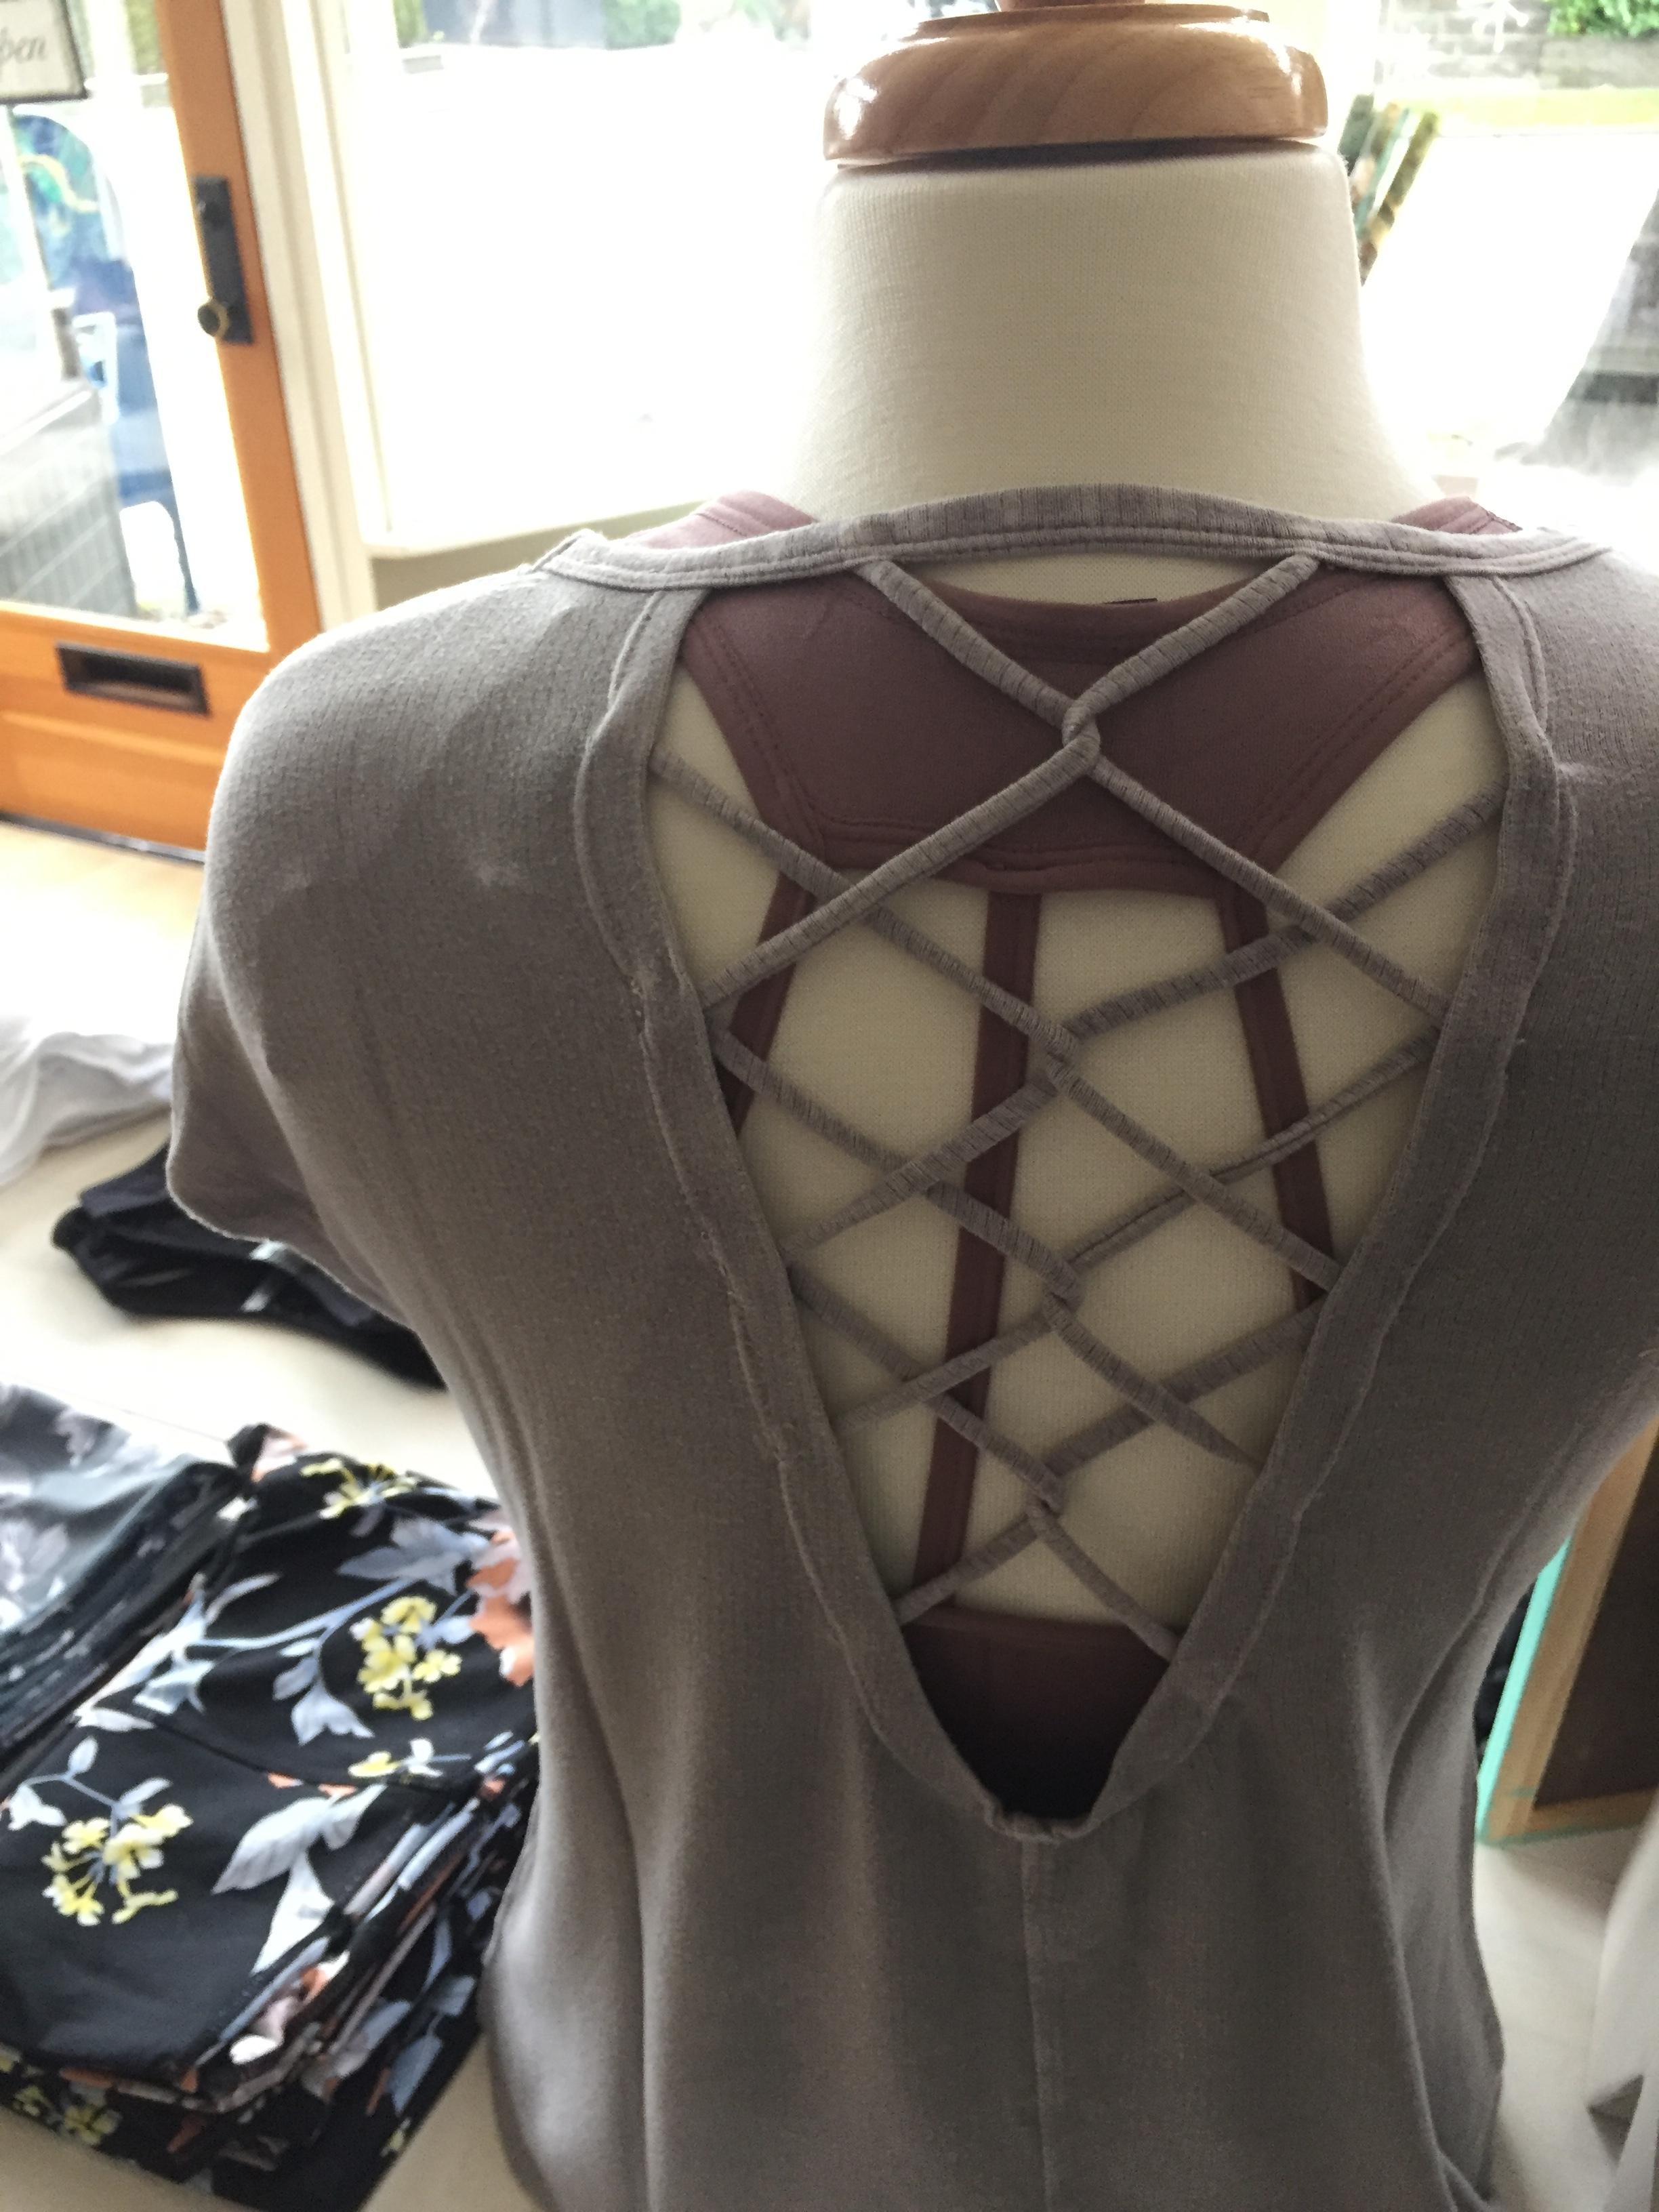 Pair a back detail tee with a fun sports bra!